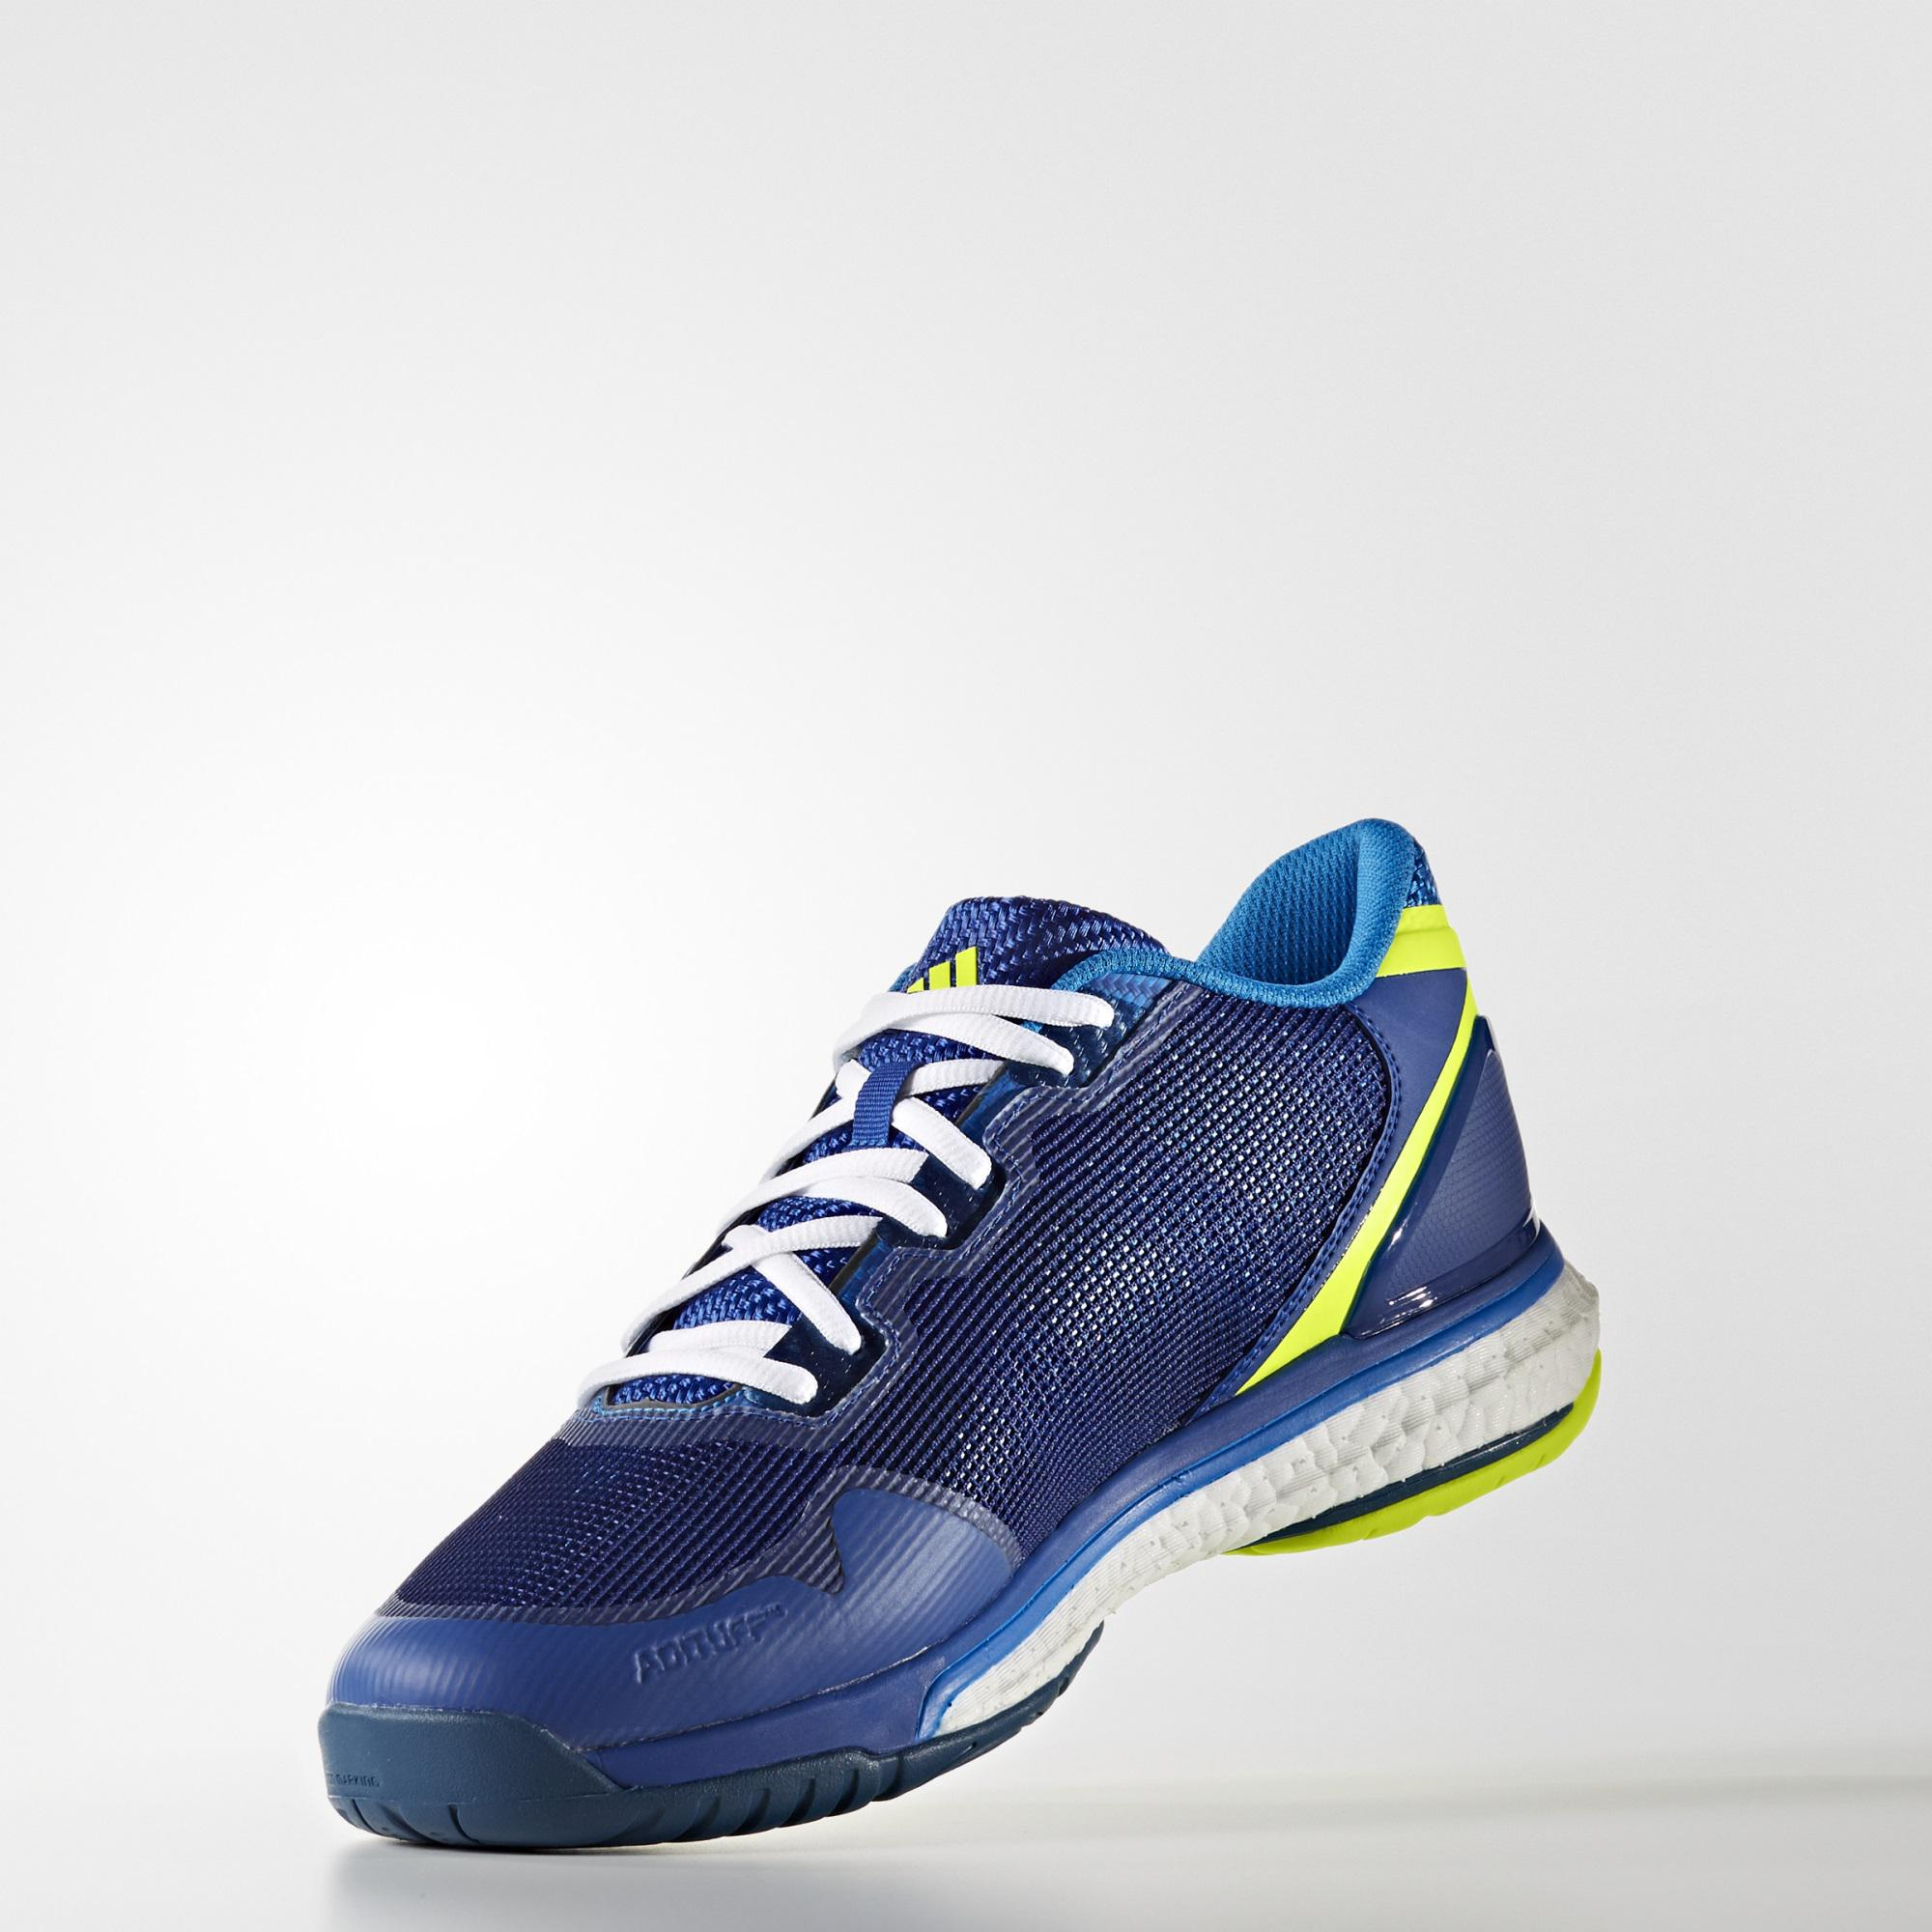 adidas mens stabil boost 2 indoor shoes blue. Black Bedroom Furniture Sets. Home Design Ideas